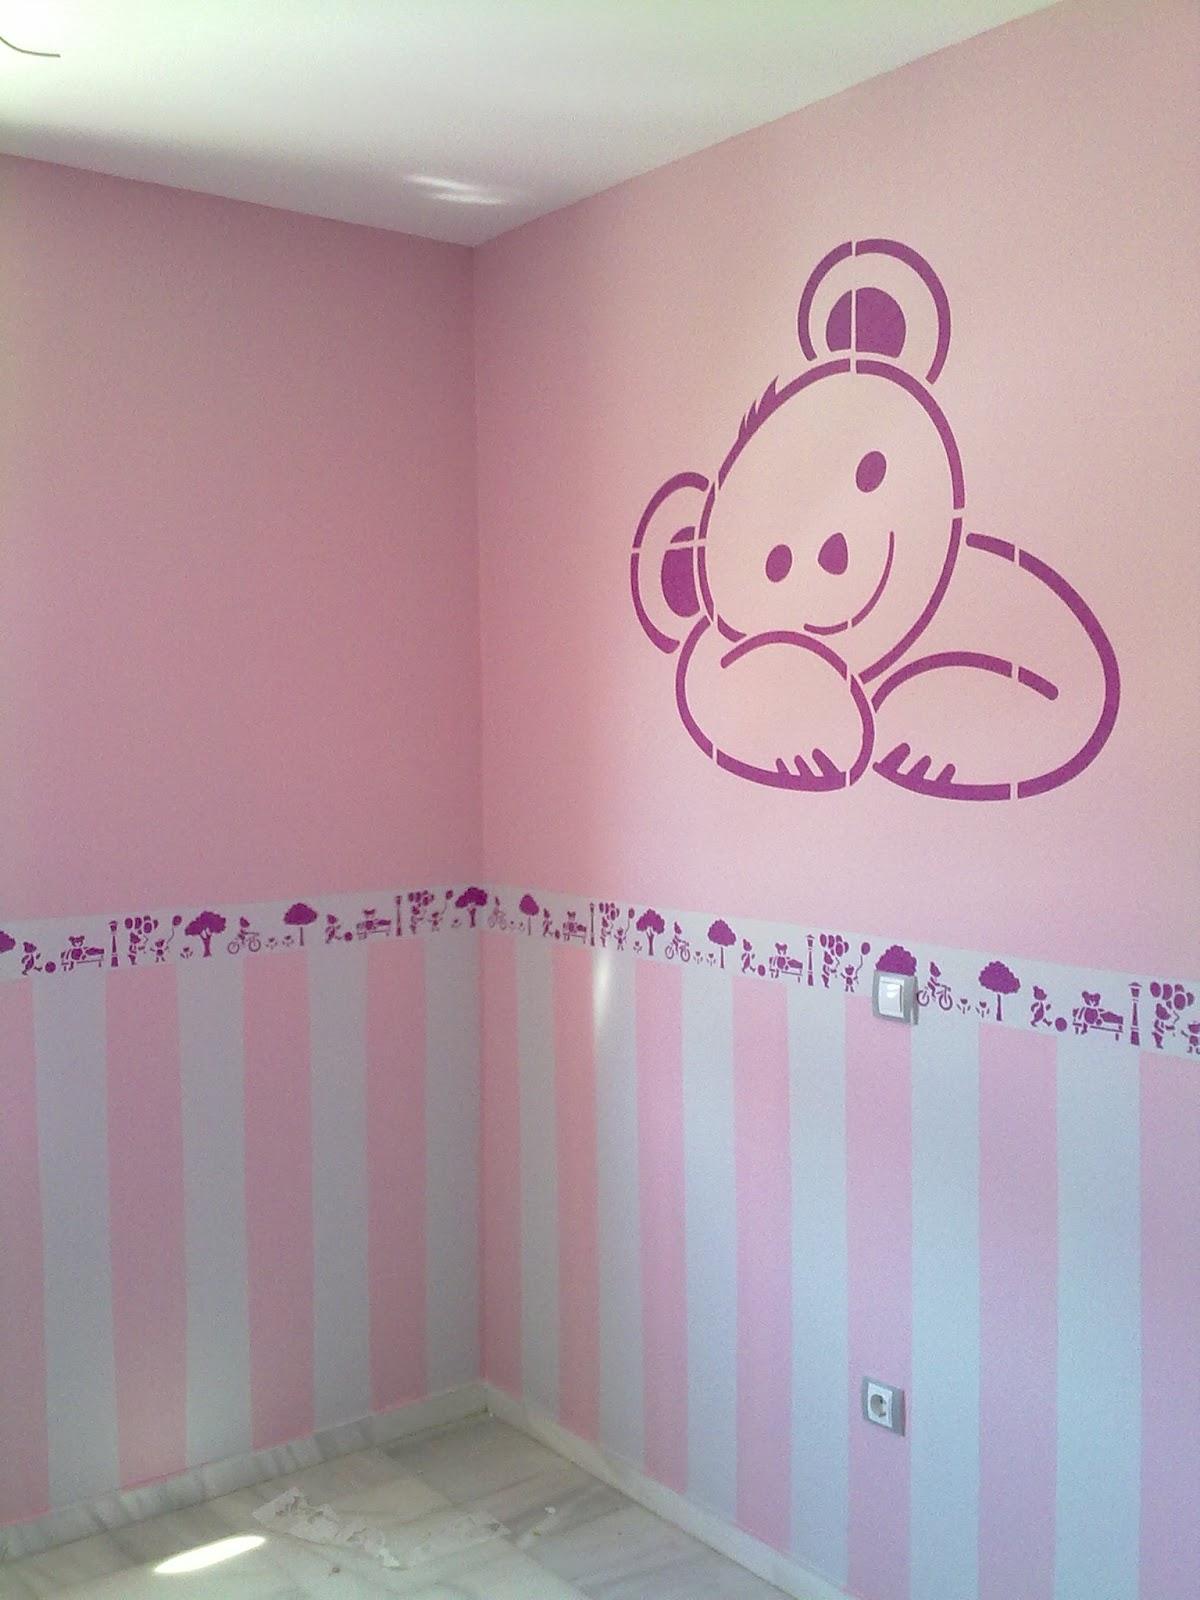 Disenyoss decoracion murales pintados a mano - Murales pintados a mano ...